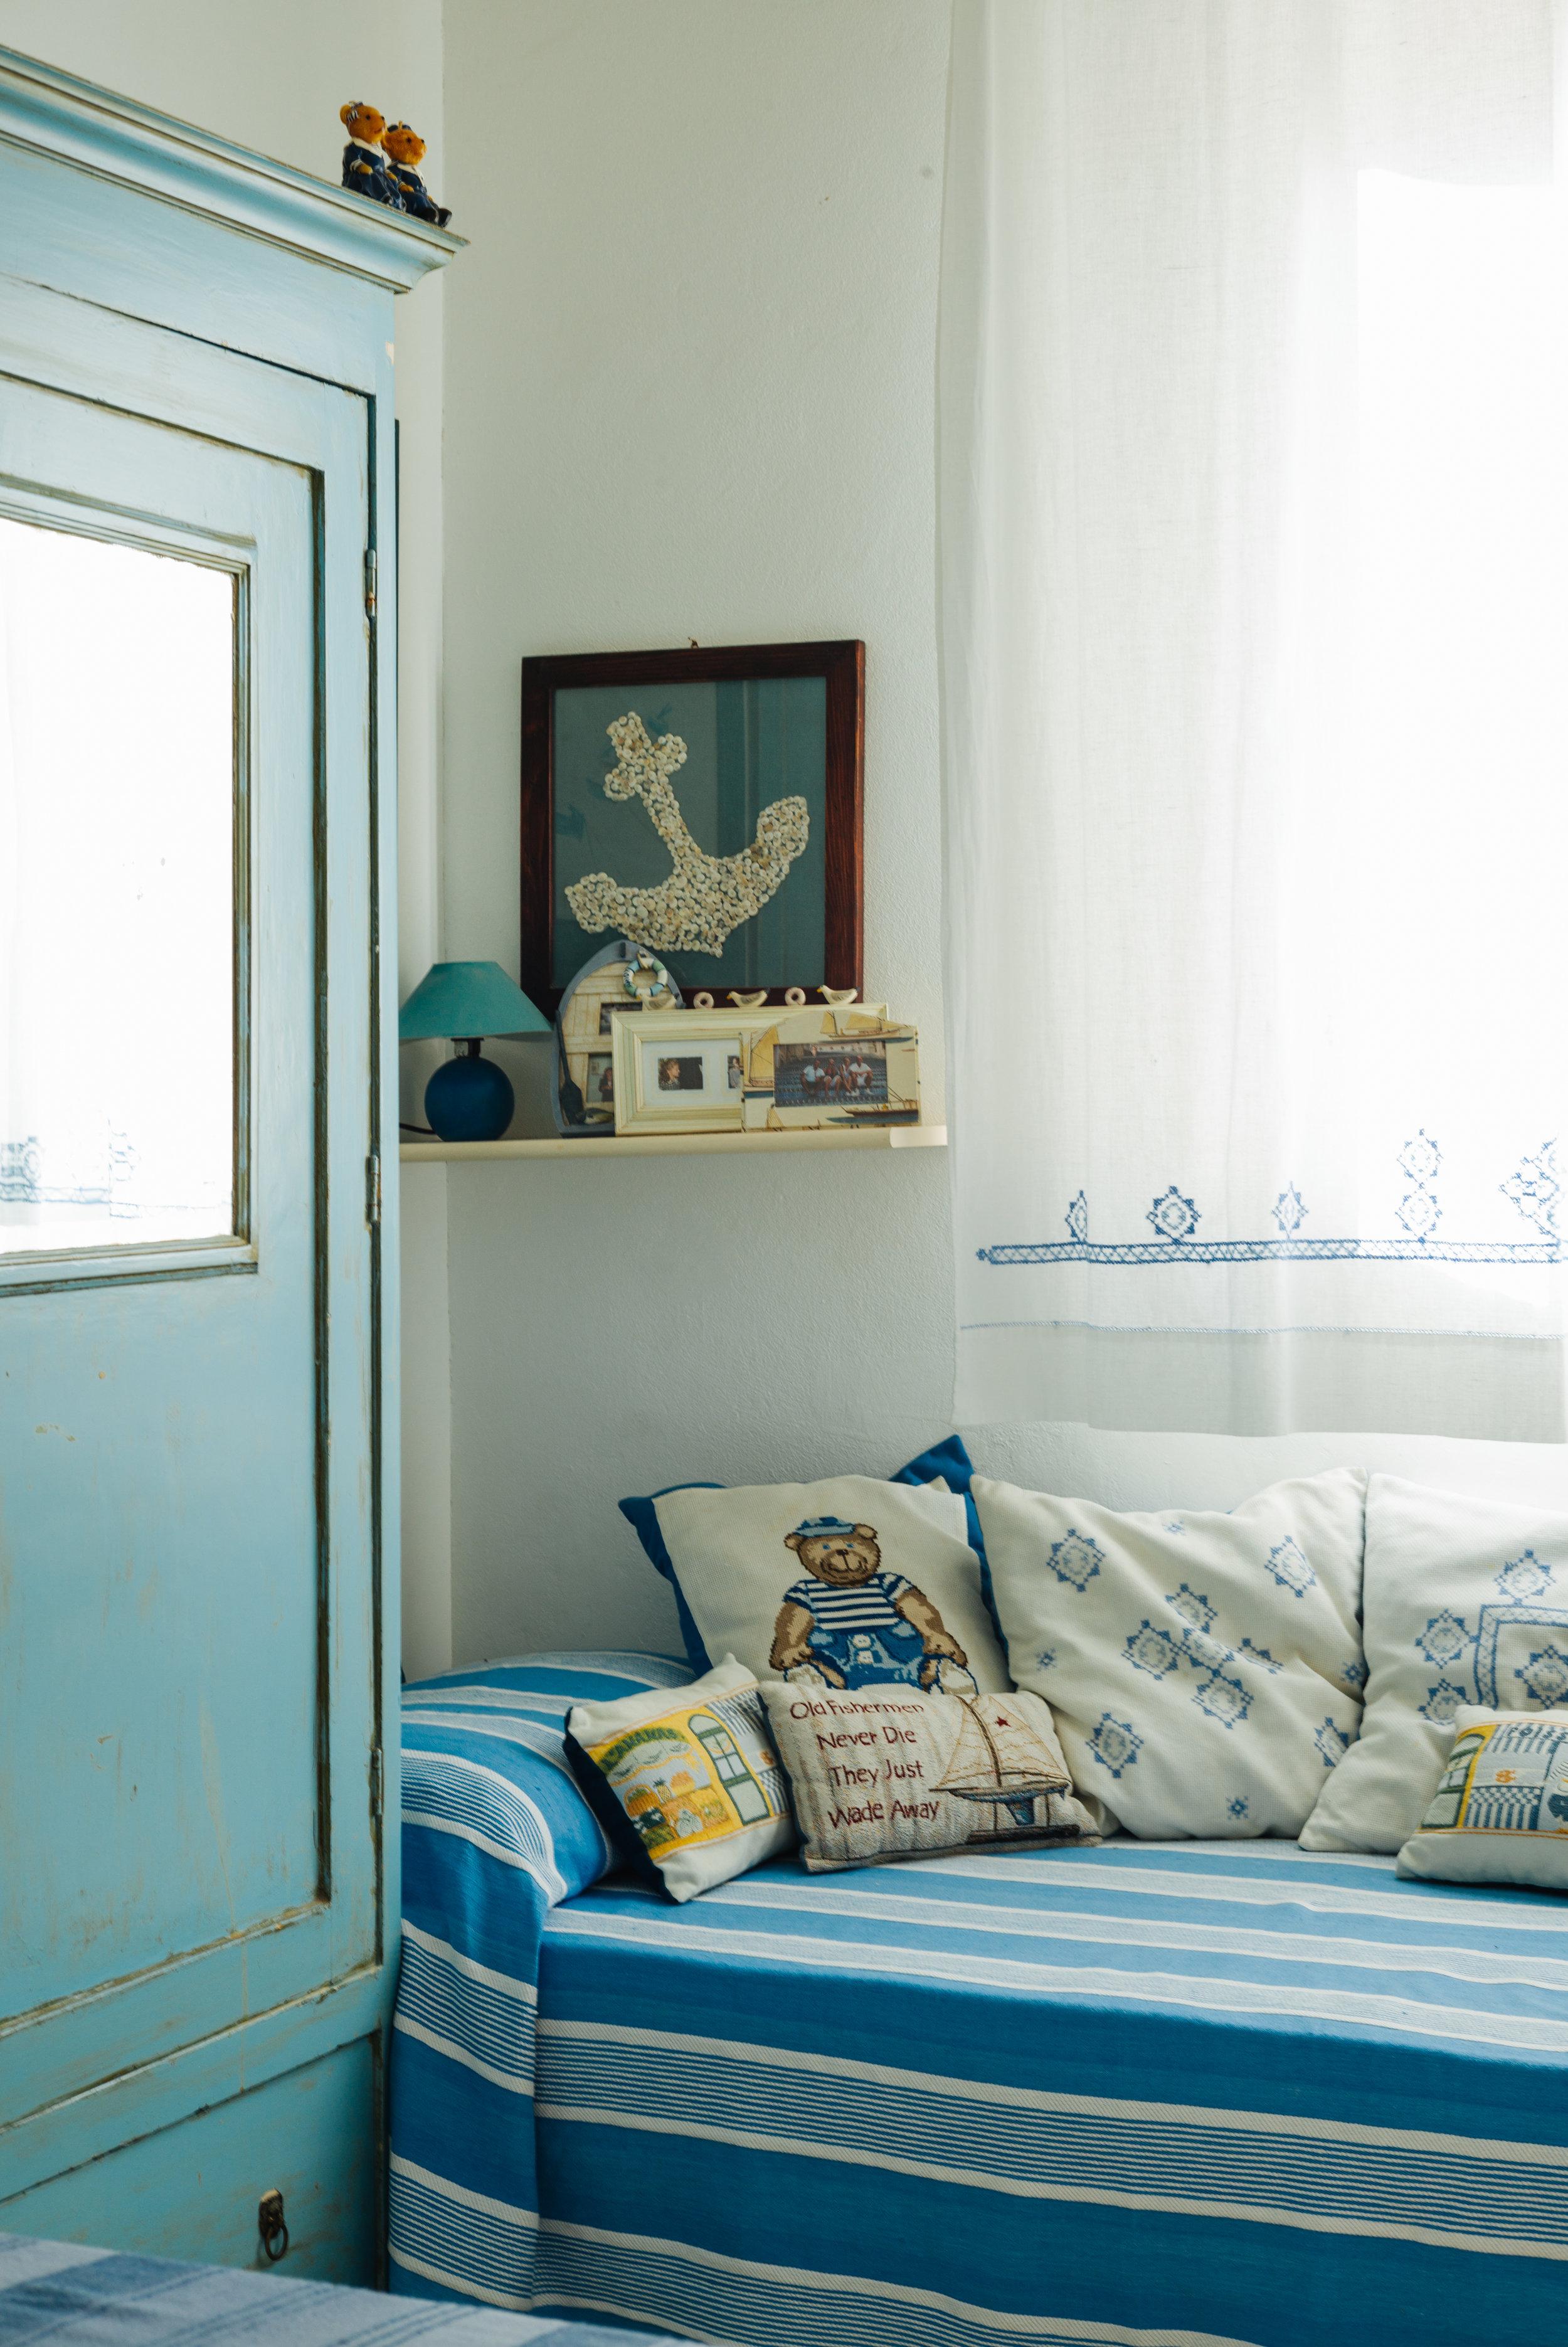 14sampieri-casa-vacanze-sicilia-appartamento-sicily-holiday-apartment-casazzurra-italia-italy.jpg